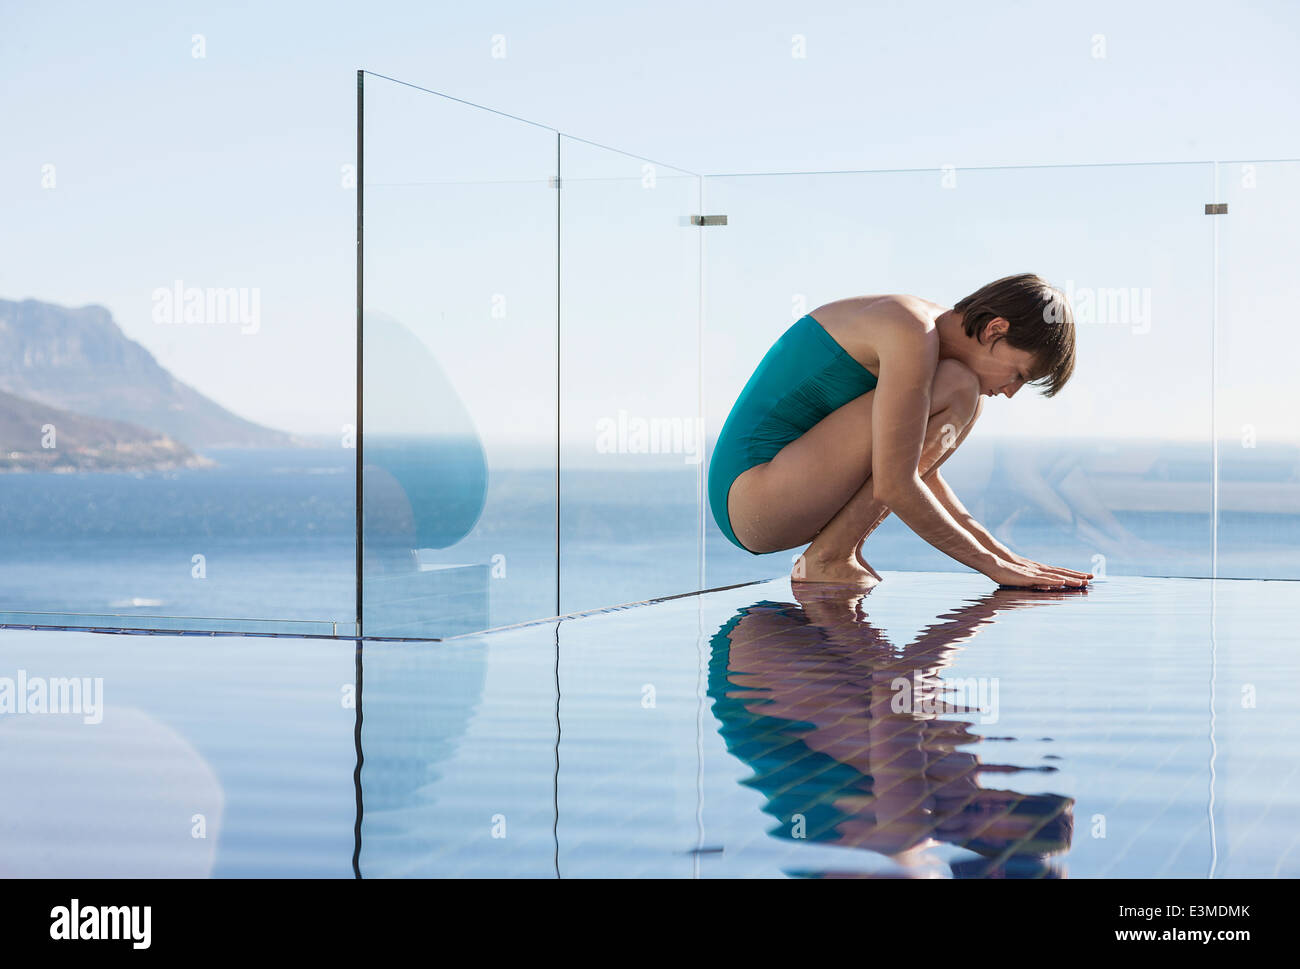 Frau kauert über Infinity-Pool mit Blick aufs Meer Stockfoto